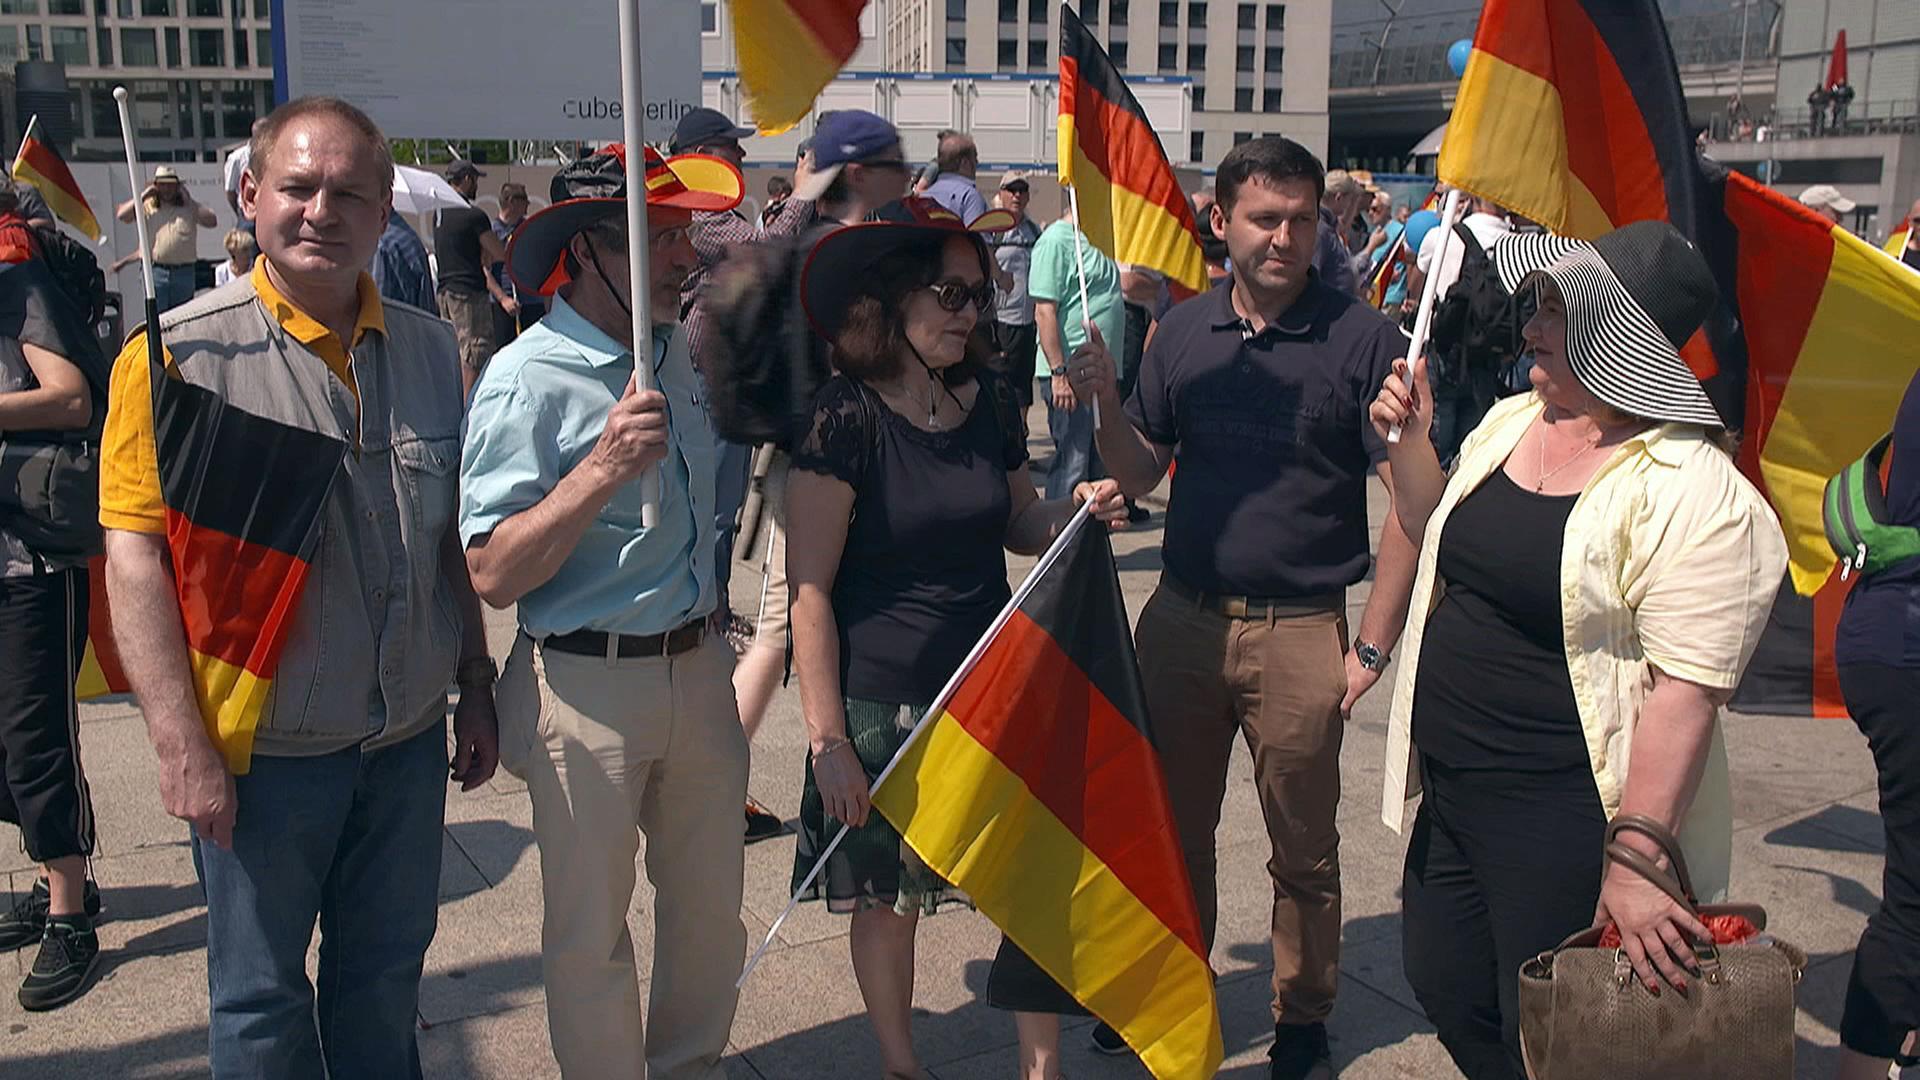 Russlanddeutsche Neue Heimat Afd Zdfmediathek